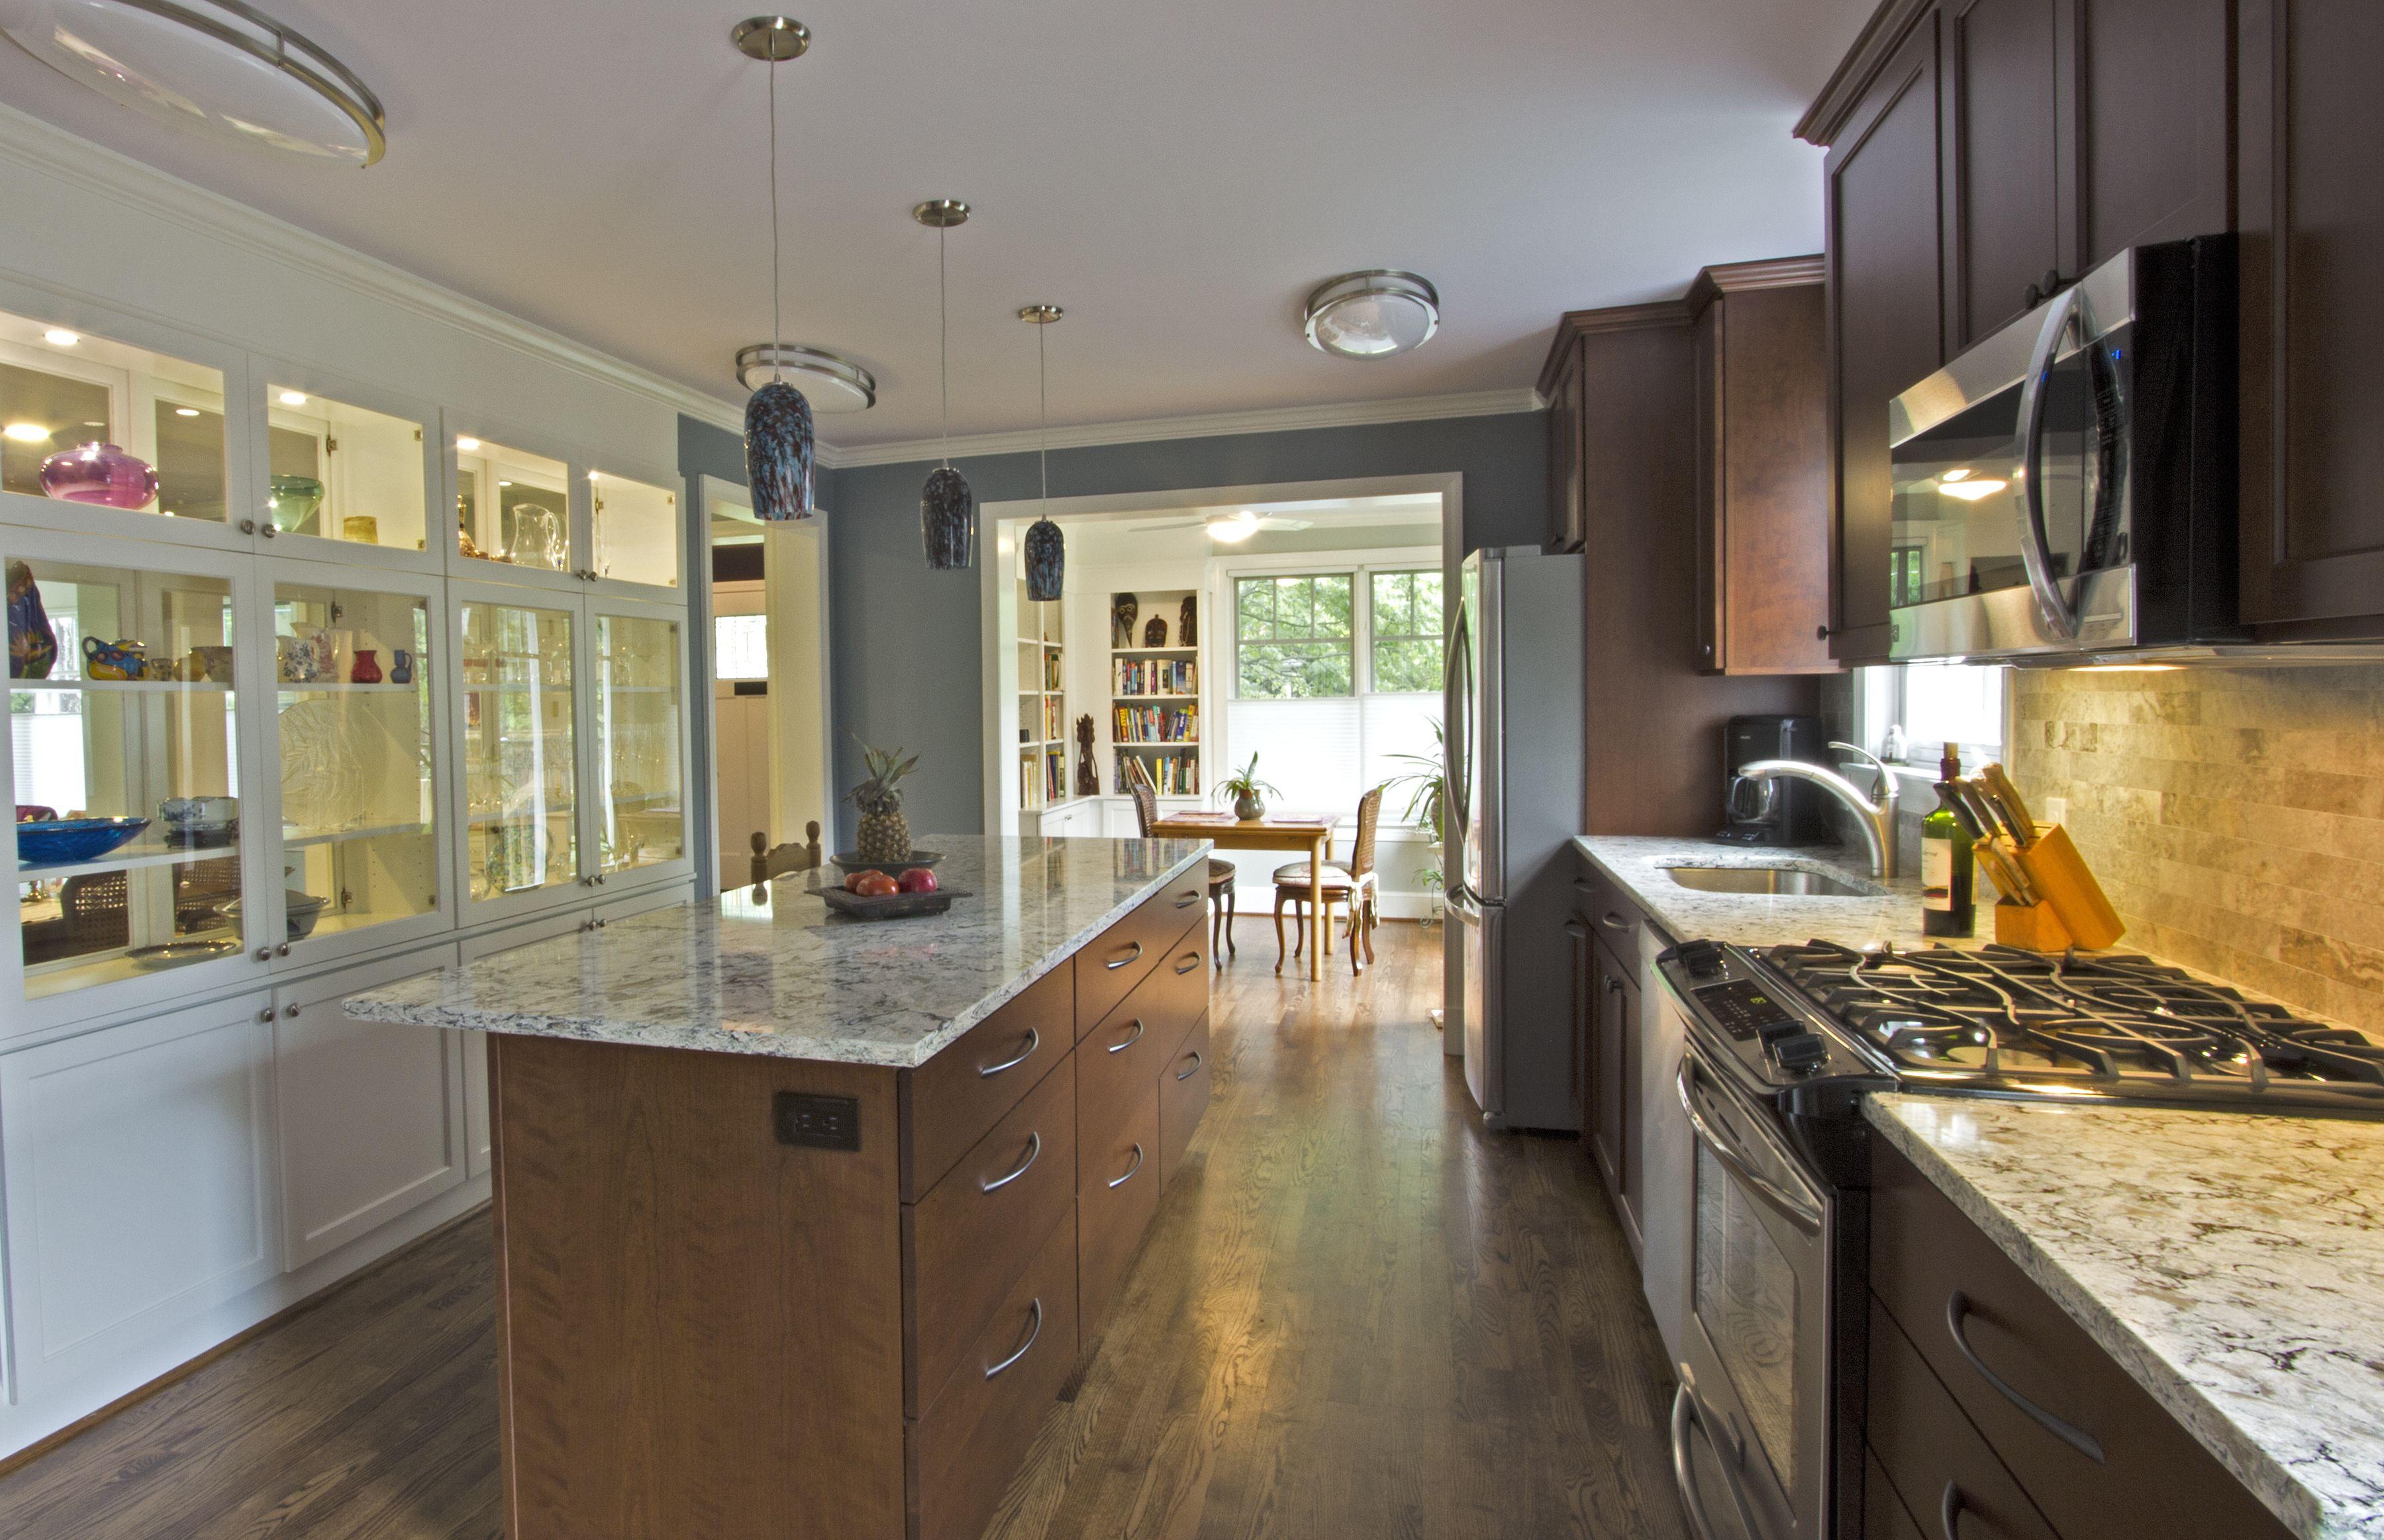 Best Open Concept Floor Plans Houses Pinterest Open concept